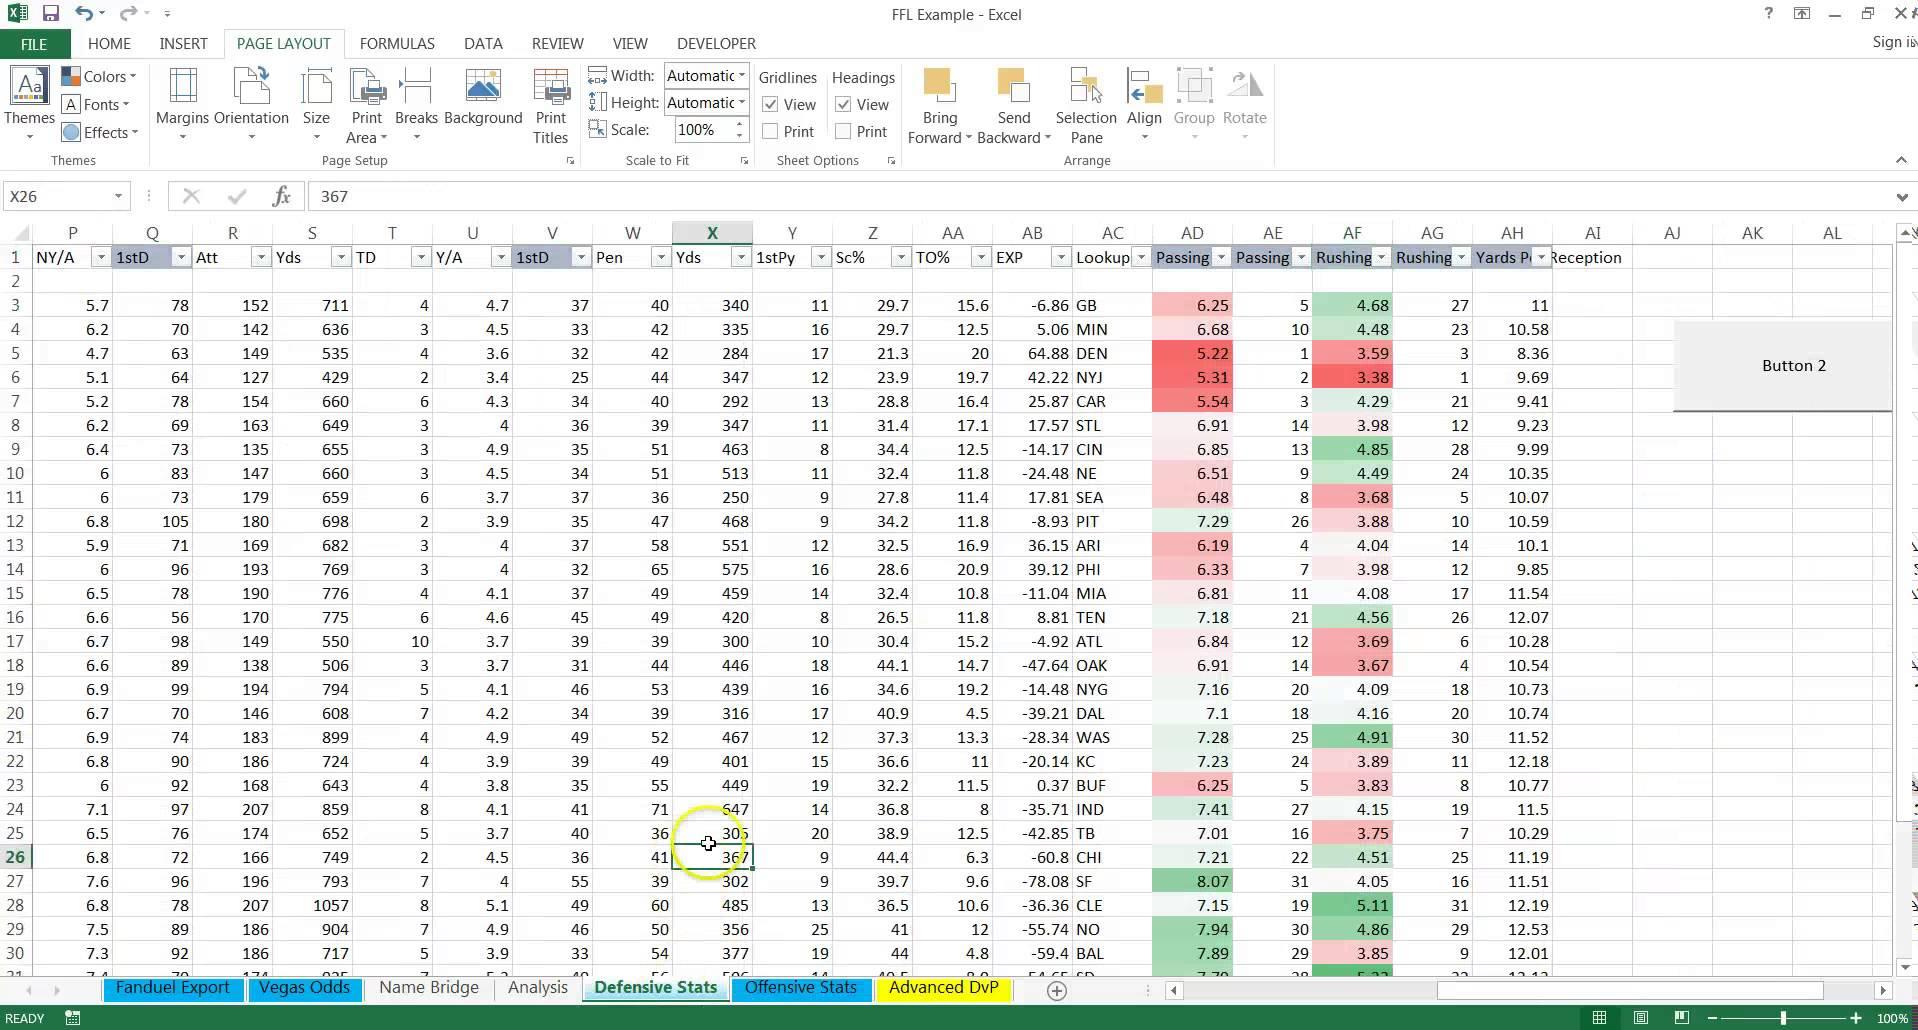 Draftkings Spreadsheet Intended For Fantasy Basketball Projections Spreadsheet  Hashtag Bg